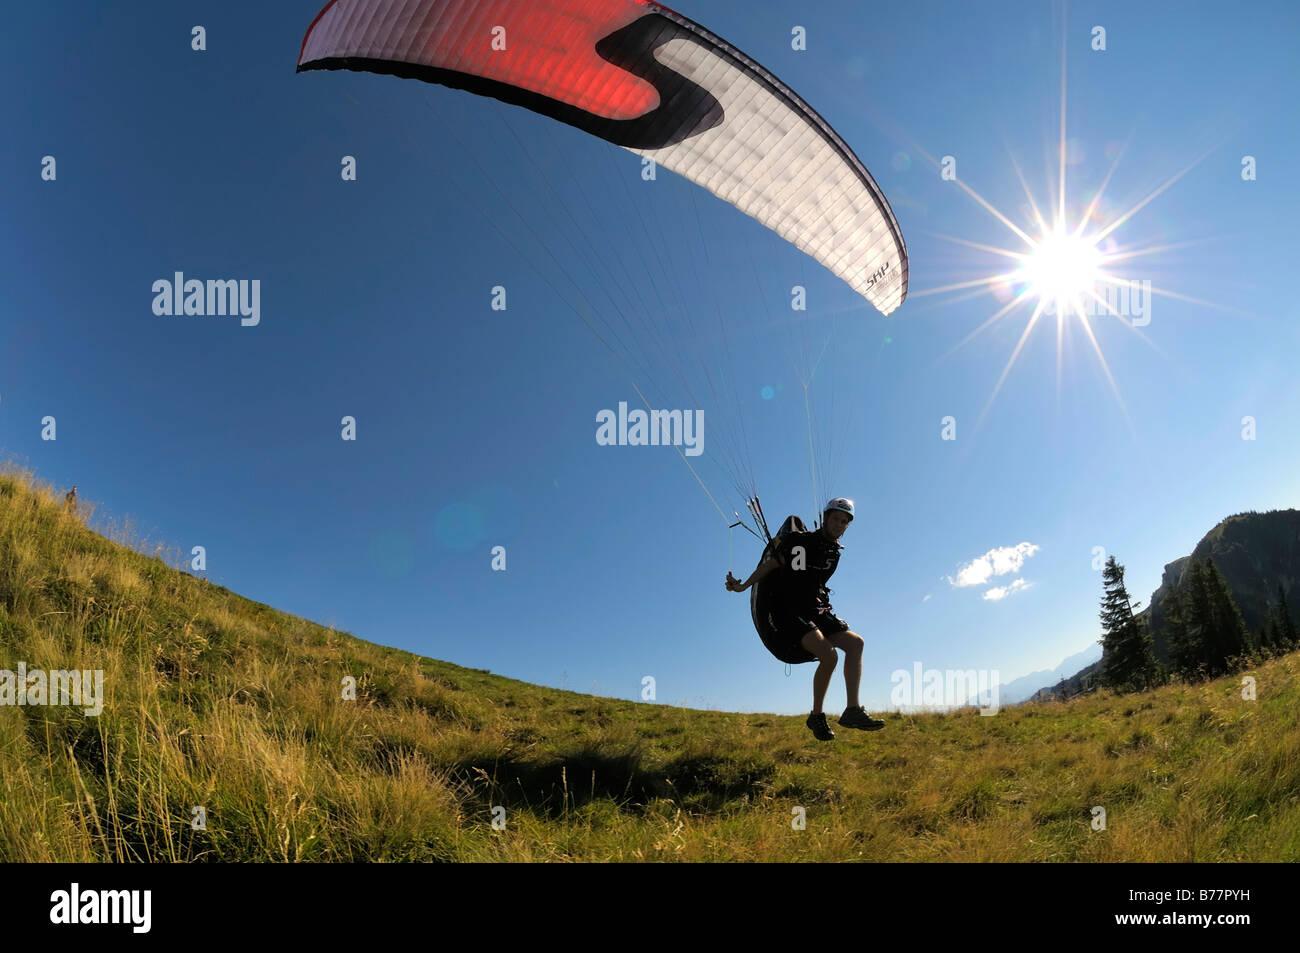 Paraglider taking off, backlit, wide-angle shot, Brauneck, Upper Bavaria, Germany, Europe Stock Photo